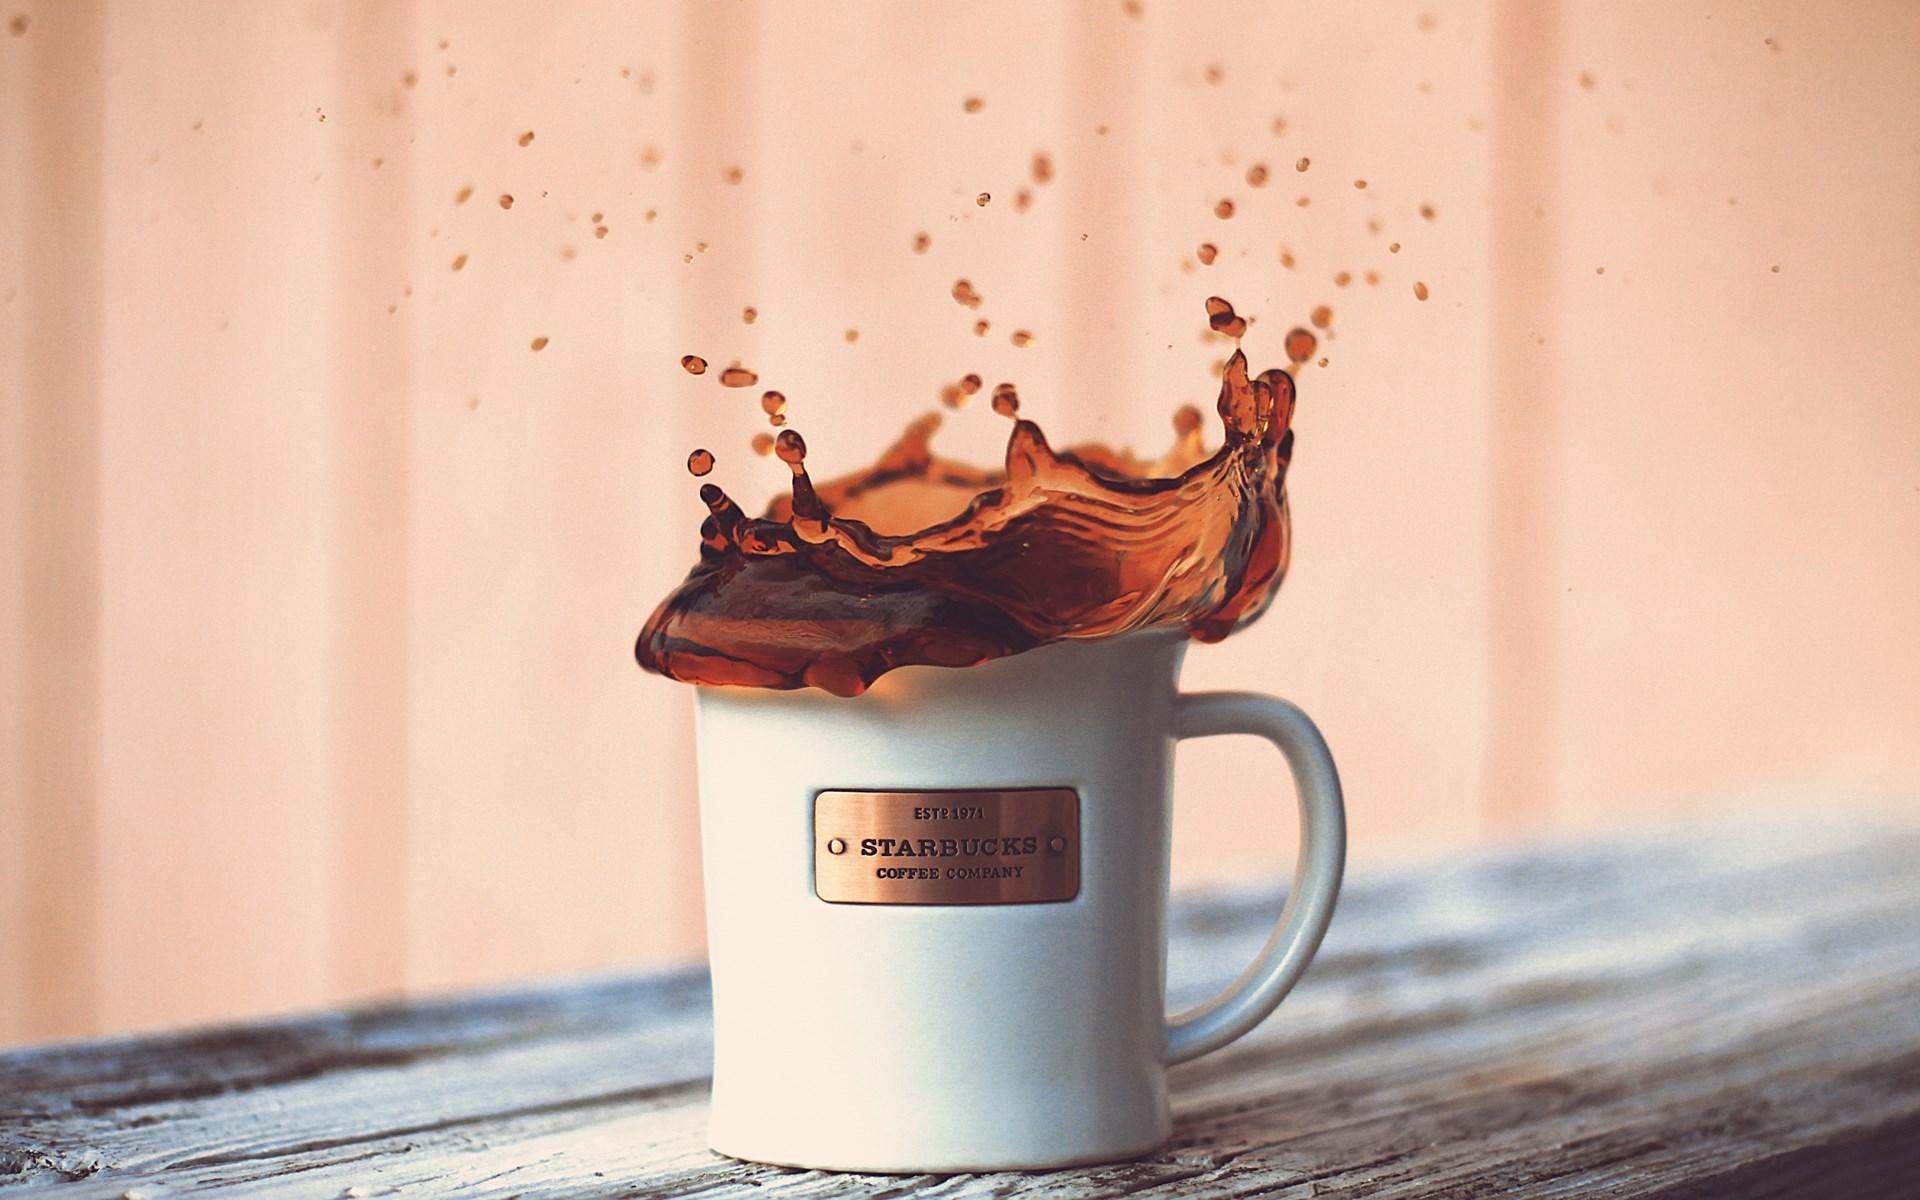 Starbucks Coffee Splash Wallpapers 1920x1200 332542